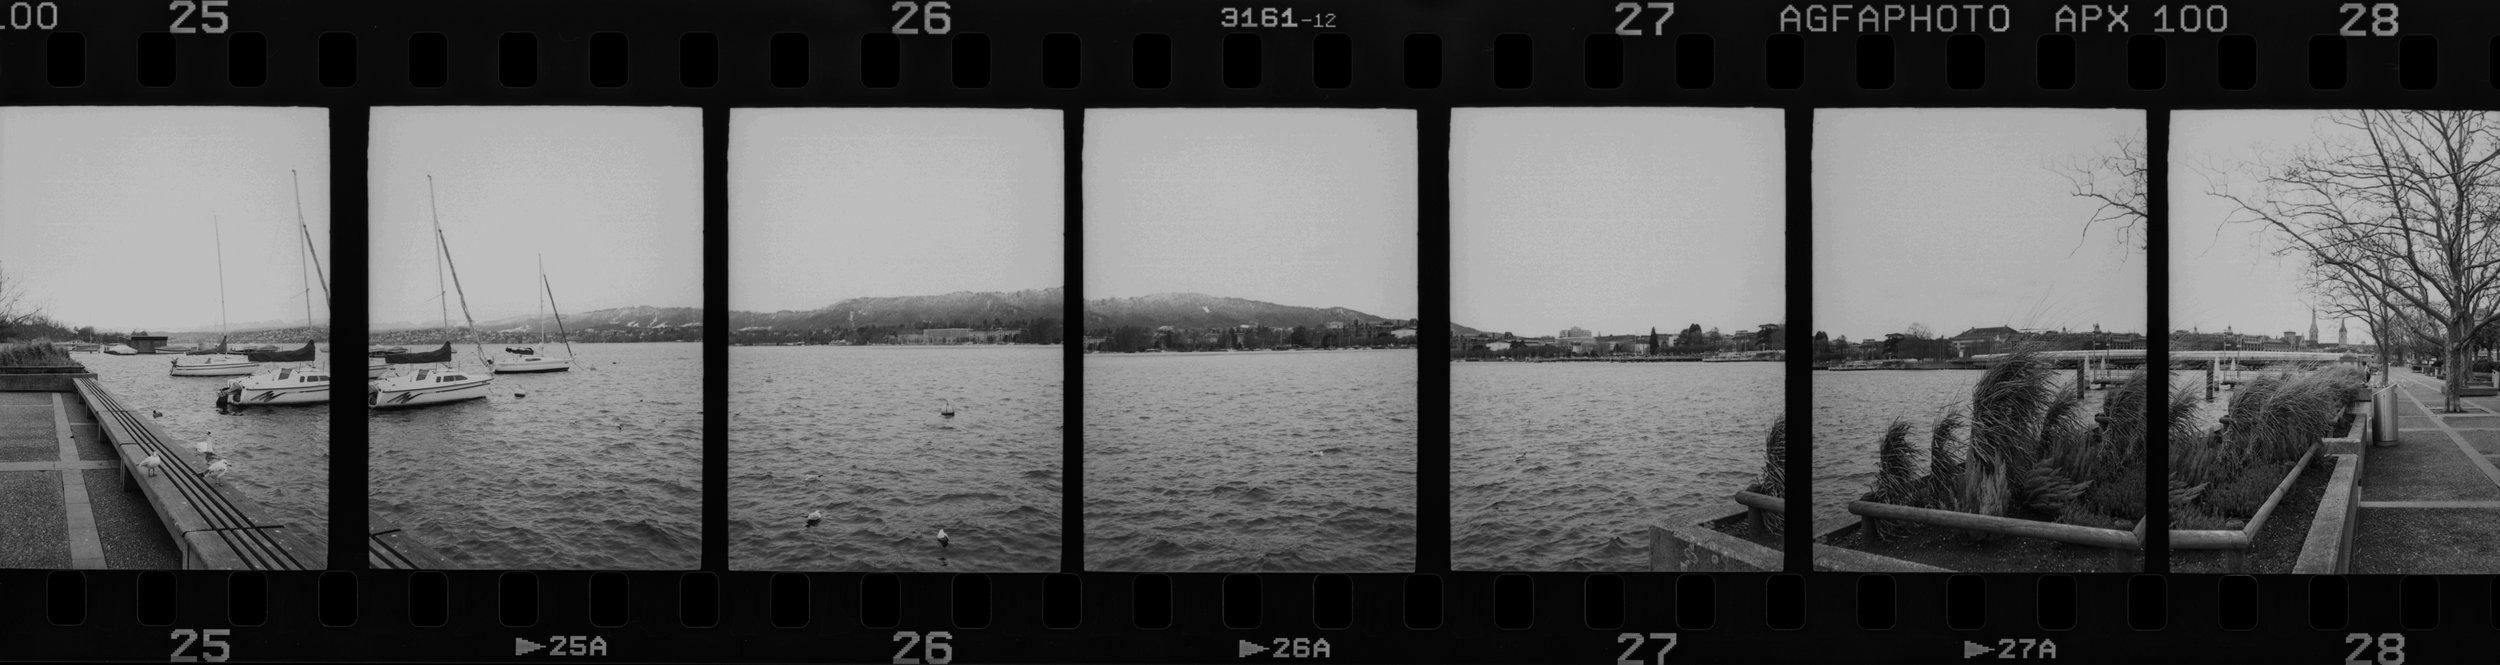 Daniel Stoessel   Panorama Pieces   Fujica Half   Agfa APX 100